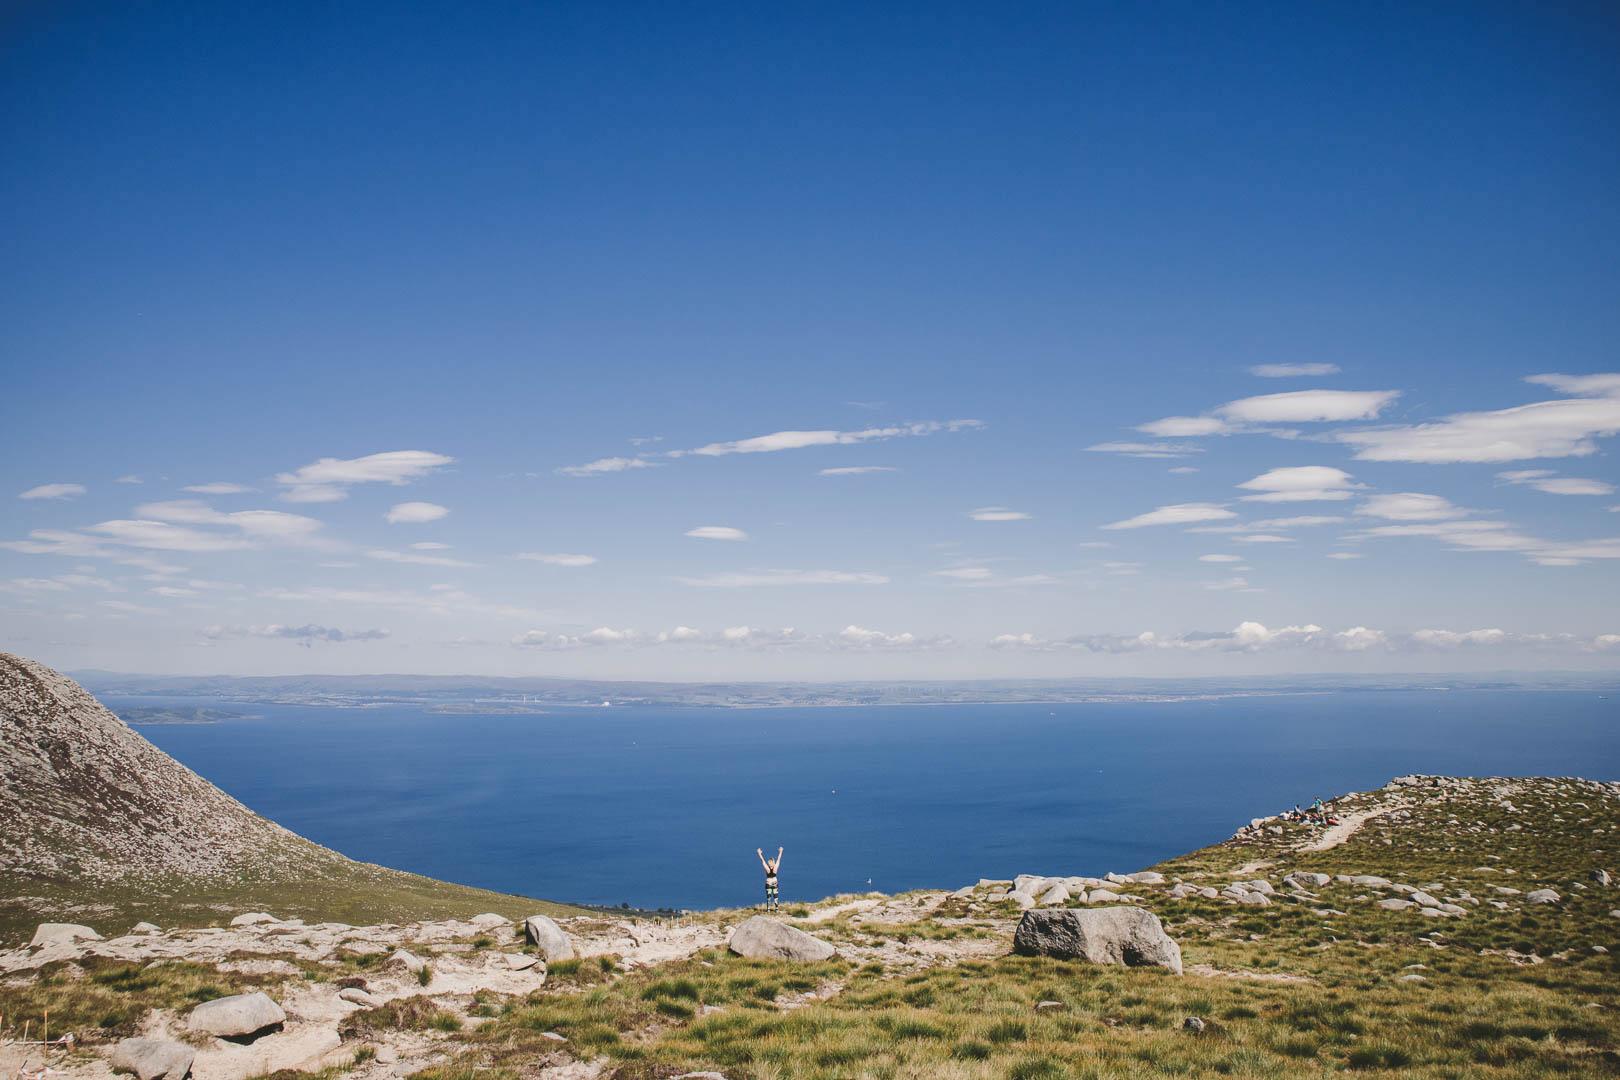 'The Cure' – Isle of Arran